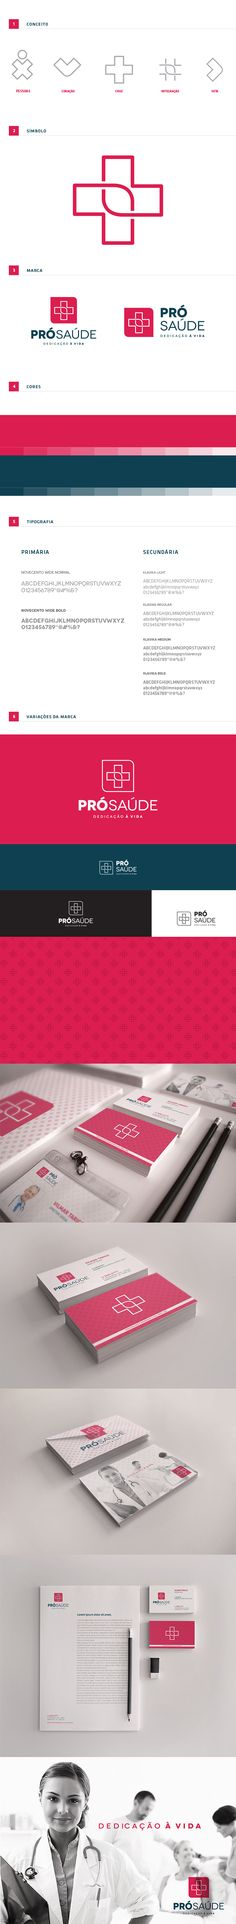 Branding Pró-Saúde on Behance